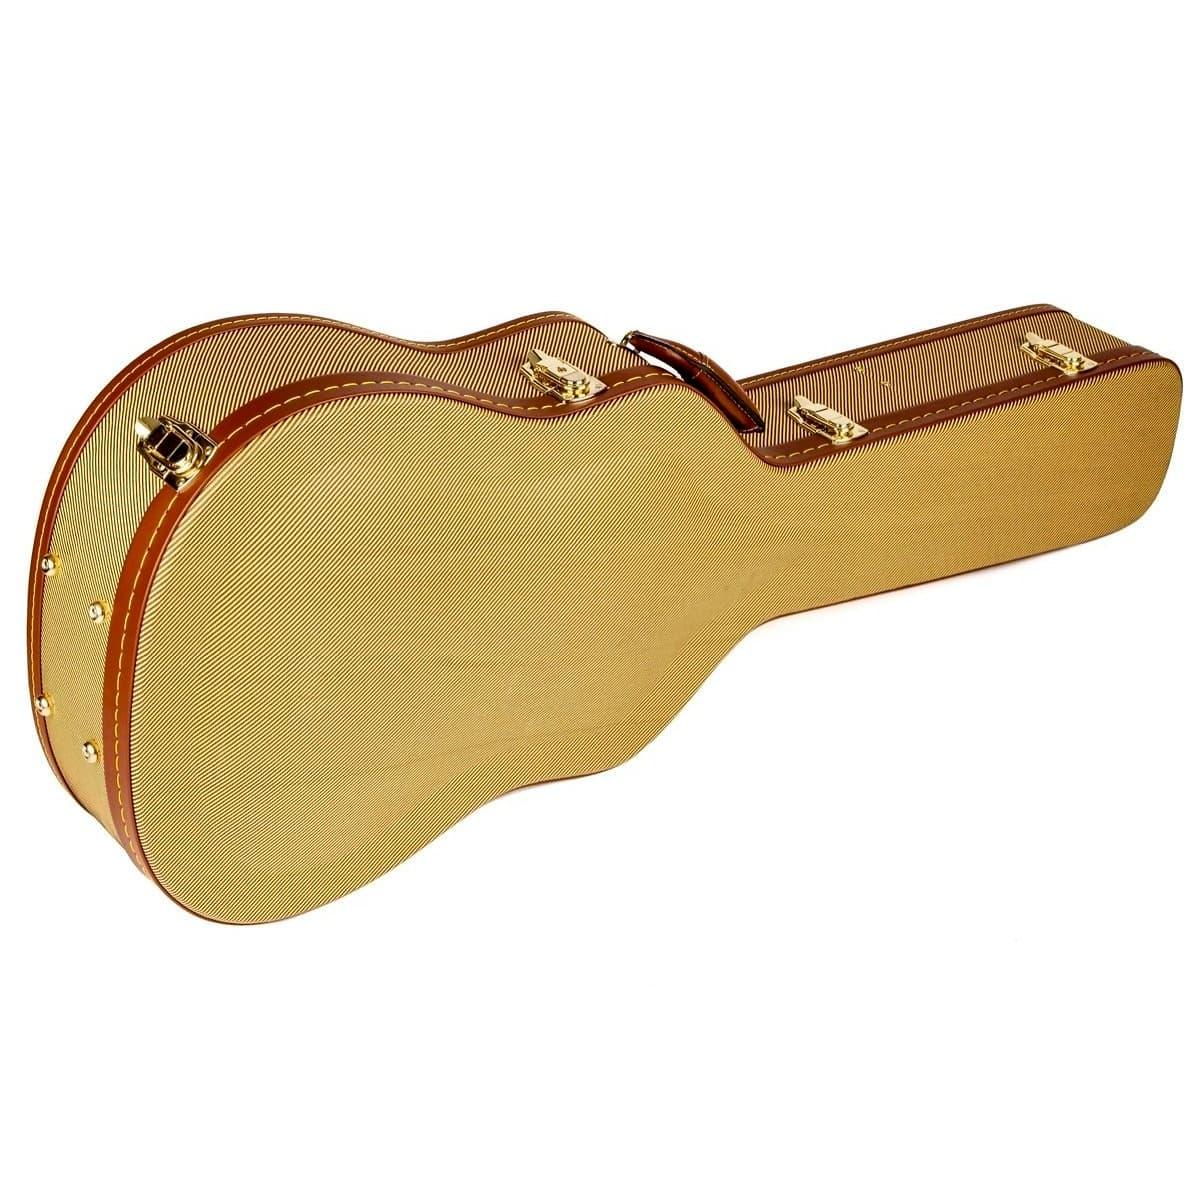 fender flat top dreadnought acoustic guitar case tweed. Black Bedroom Furniture Sets. Home Design Ideas